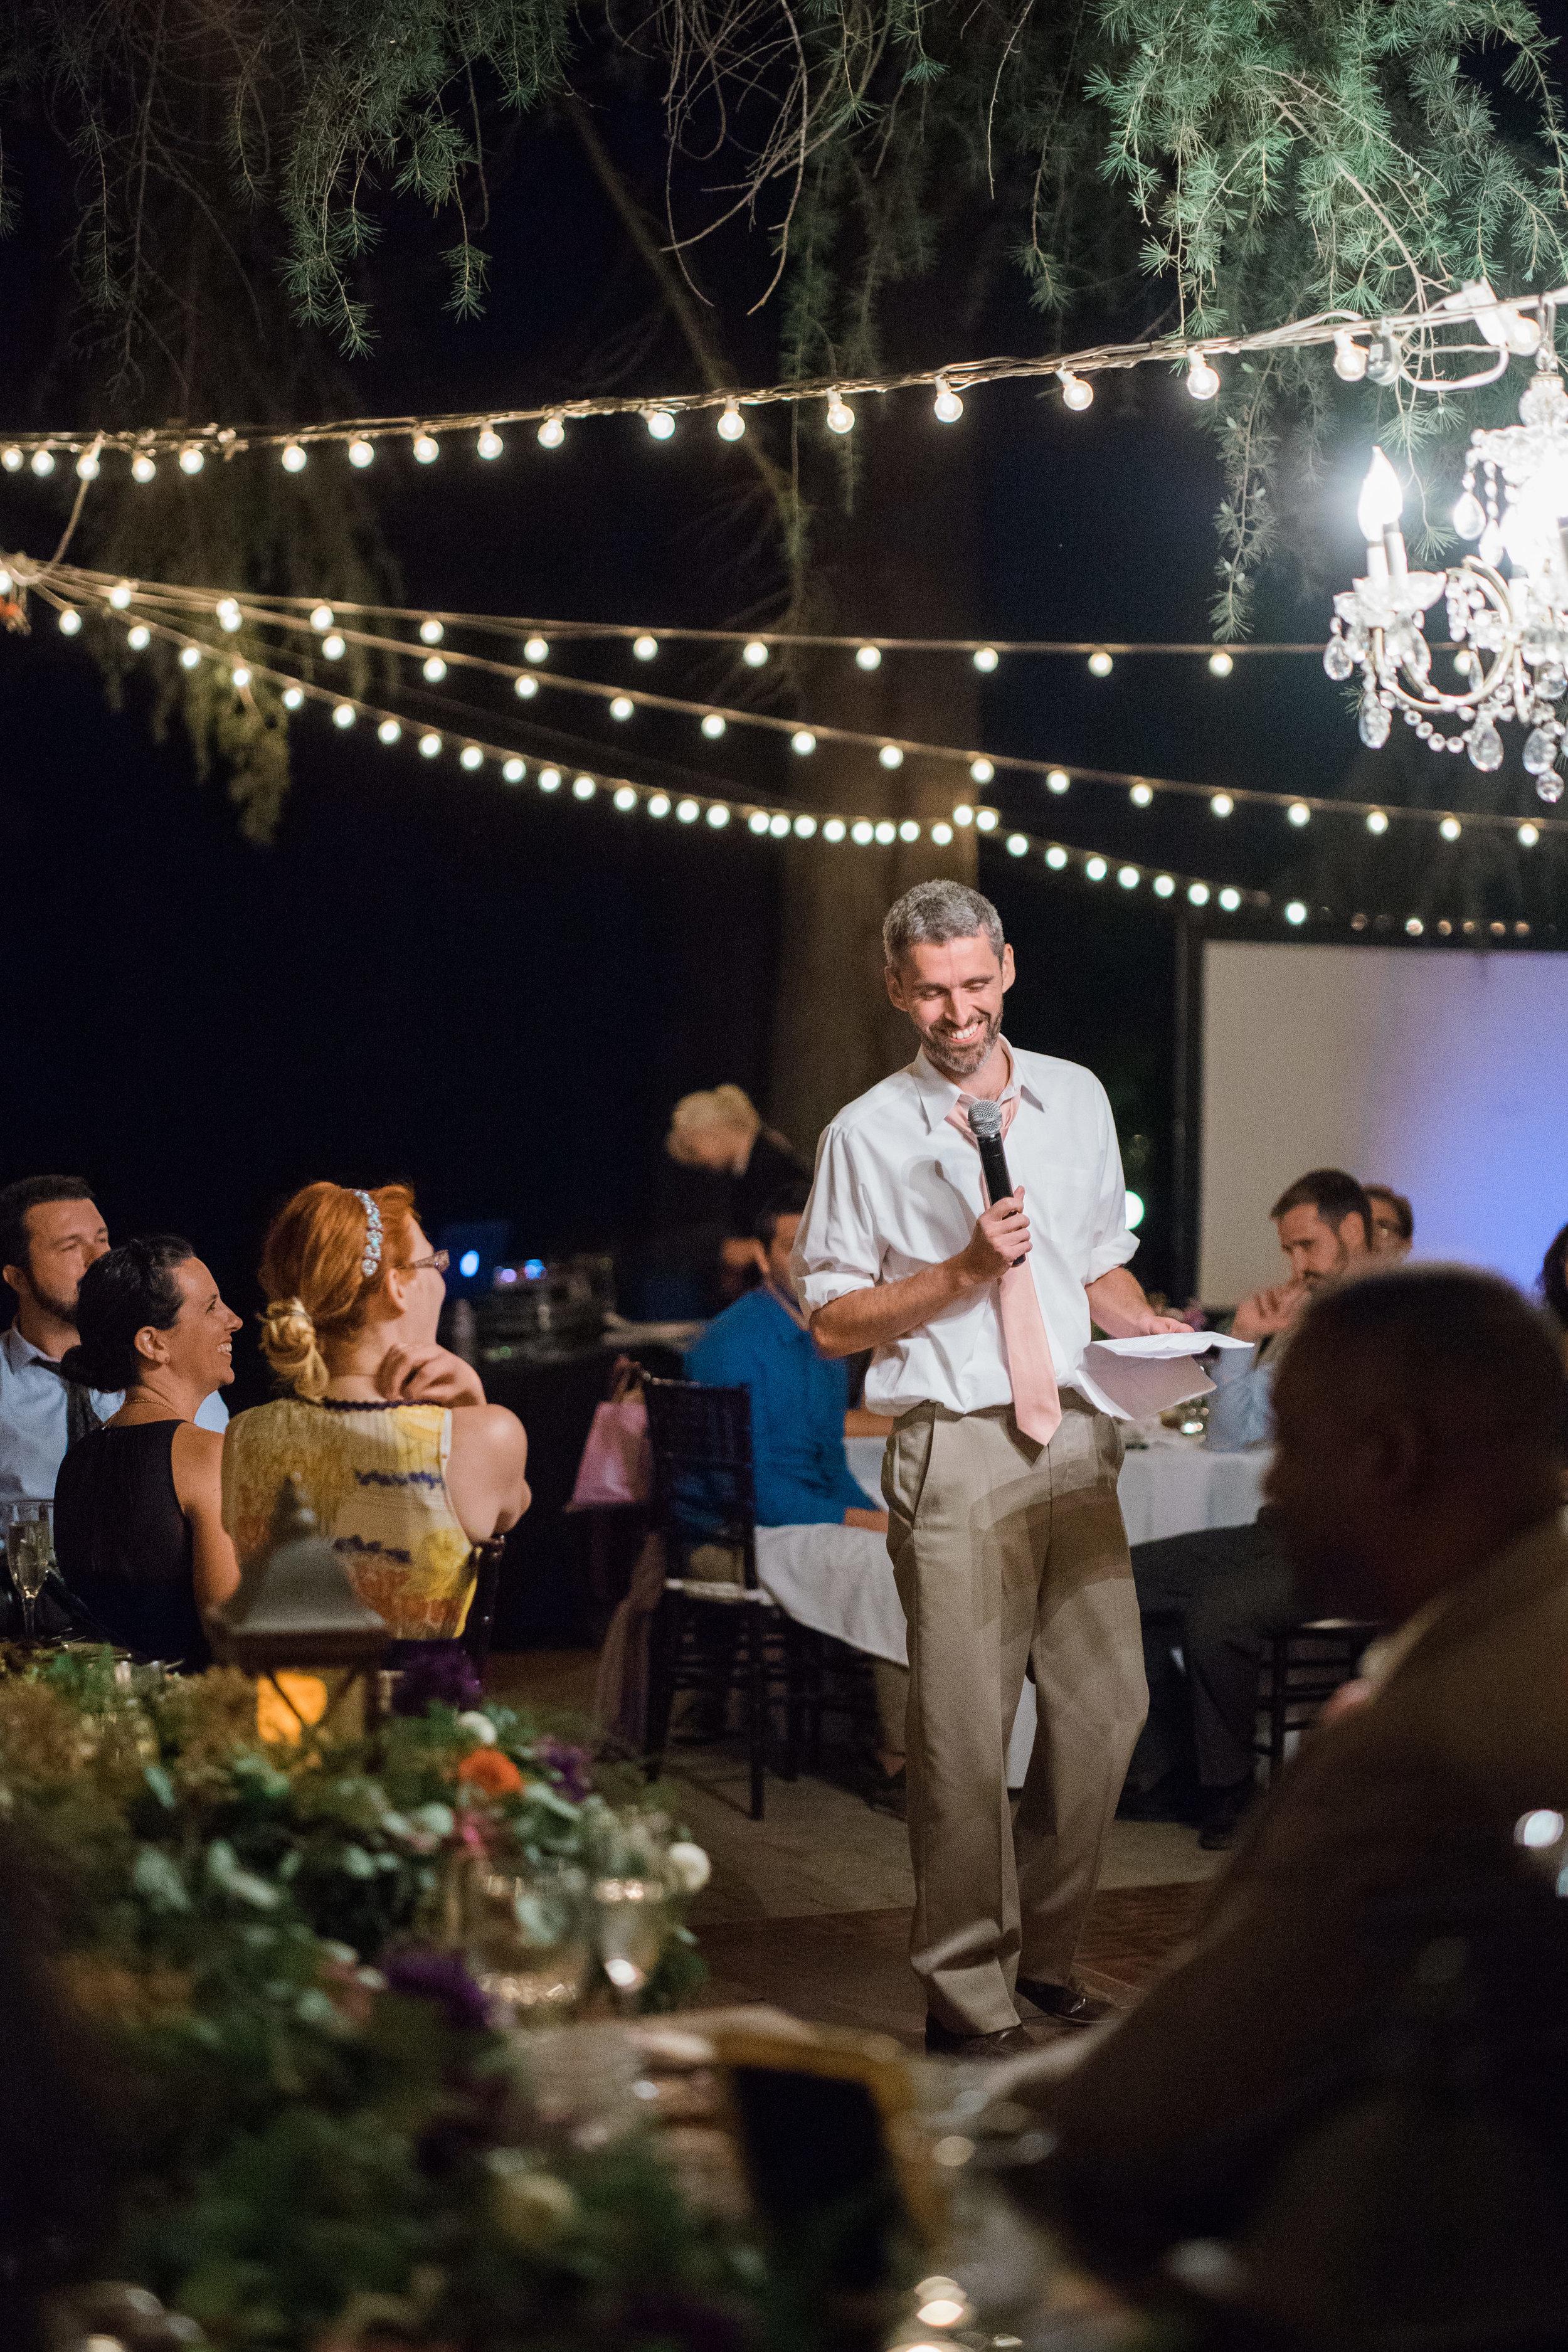 Jenny Quicksall Photography_www.jennyquicksall.com_California Wedding Photographer_Highland Springs Ranch and Inn Resort_Cherry Valley California (98).JPG